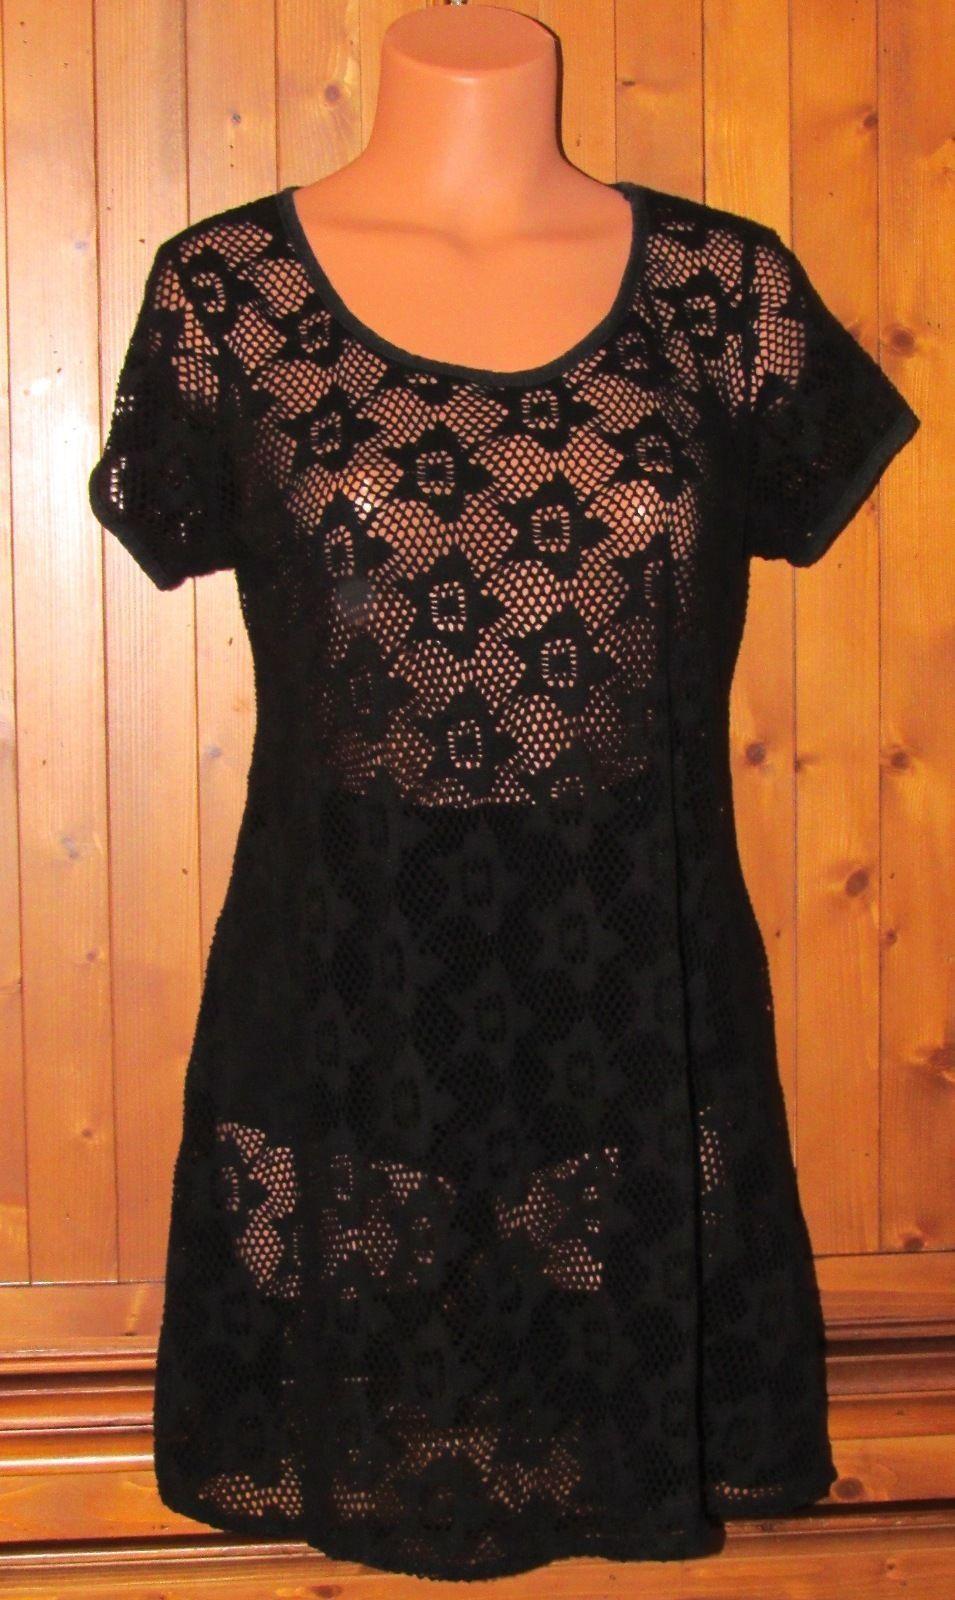 Dotti's Women's Black Crochet Lace Insert Swimwear Cover-Up/Dress Size: M